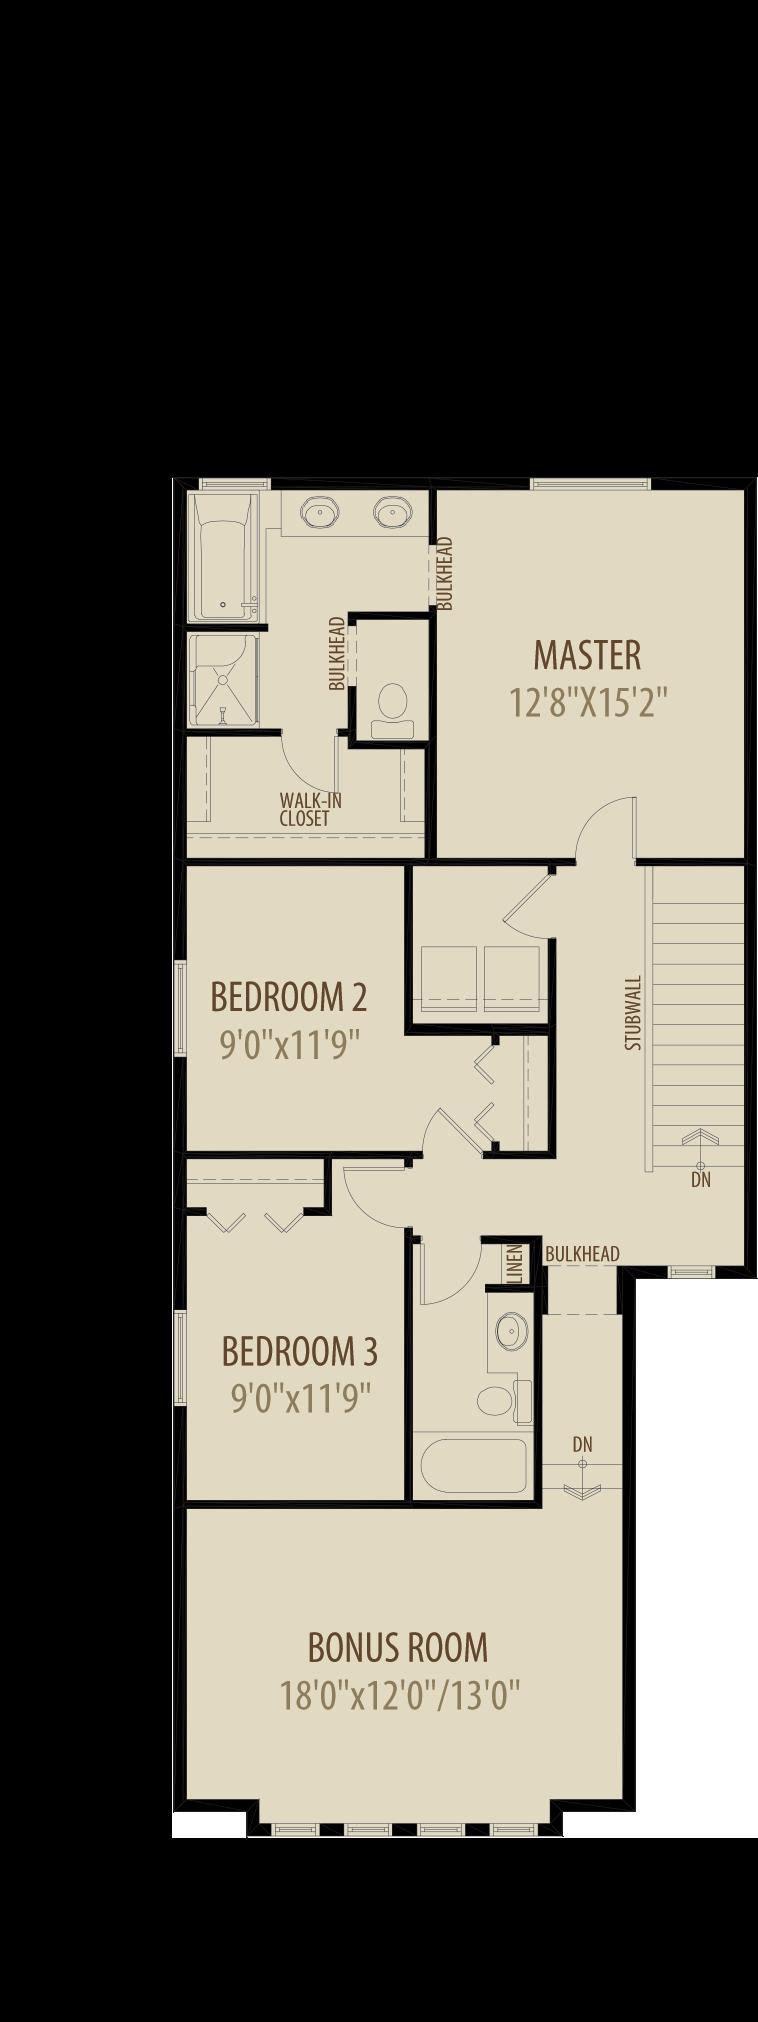 Option 2 Revised Upper Floor